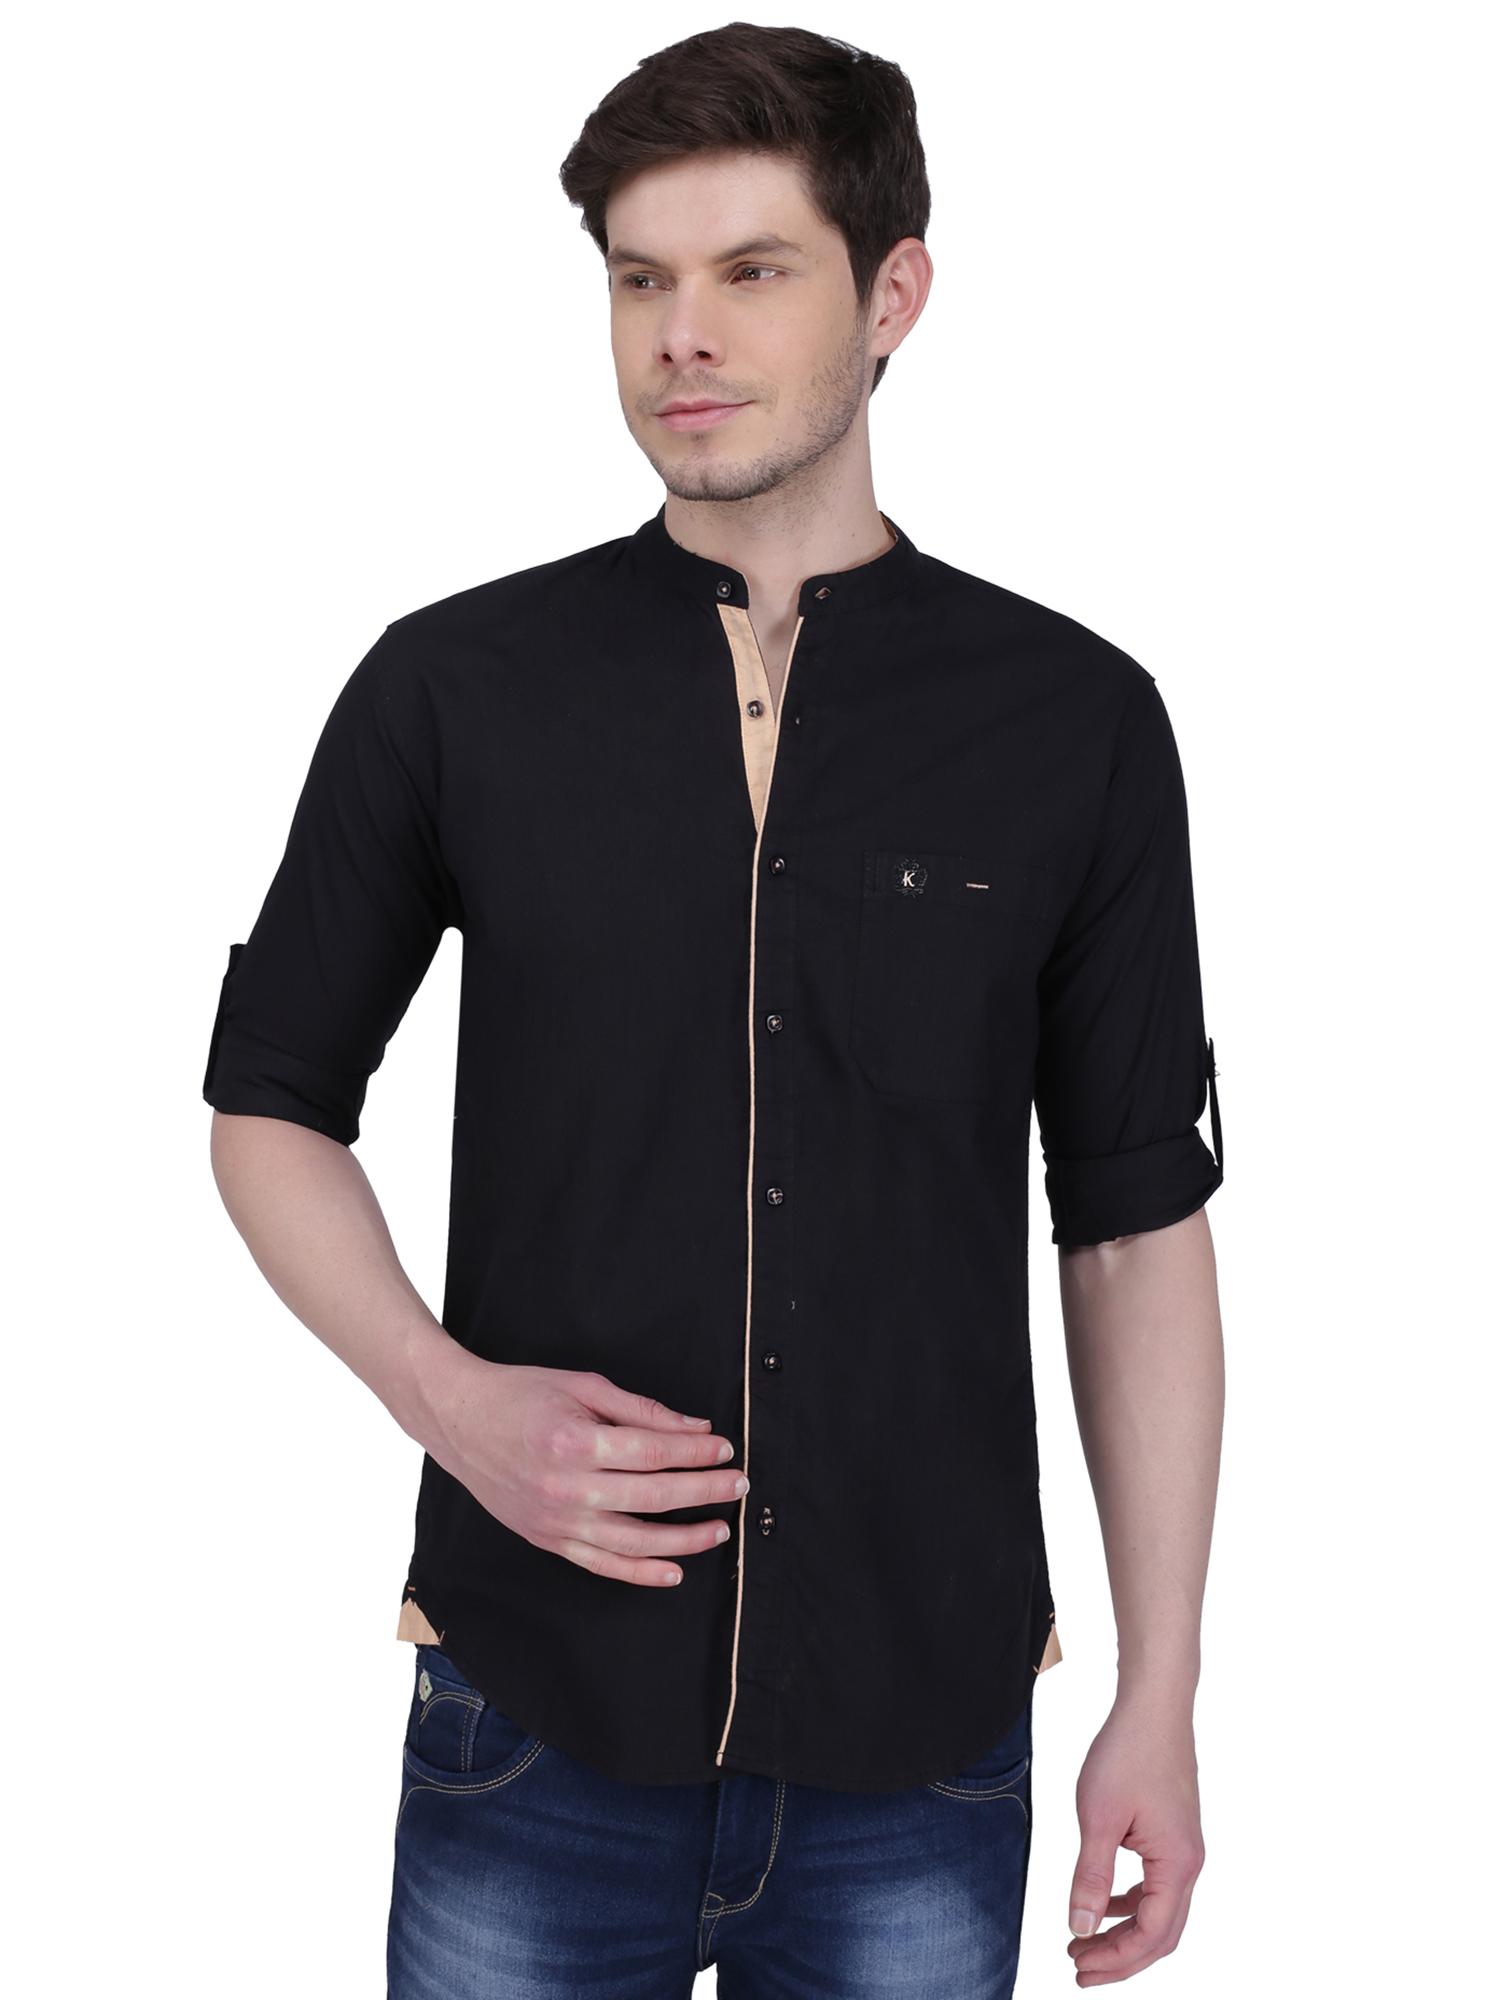 Kuons Avenue Men's Black Linen Cotton Casual Shirt- KACLFS1294BK